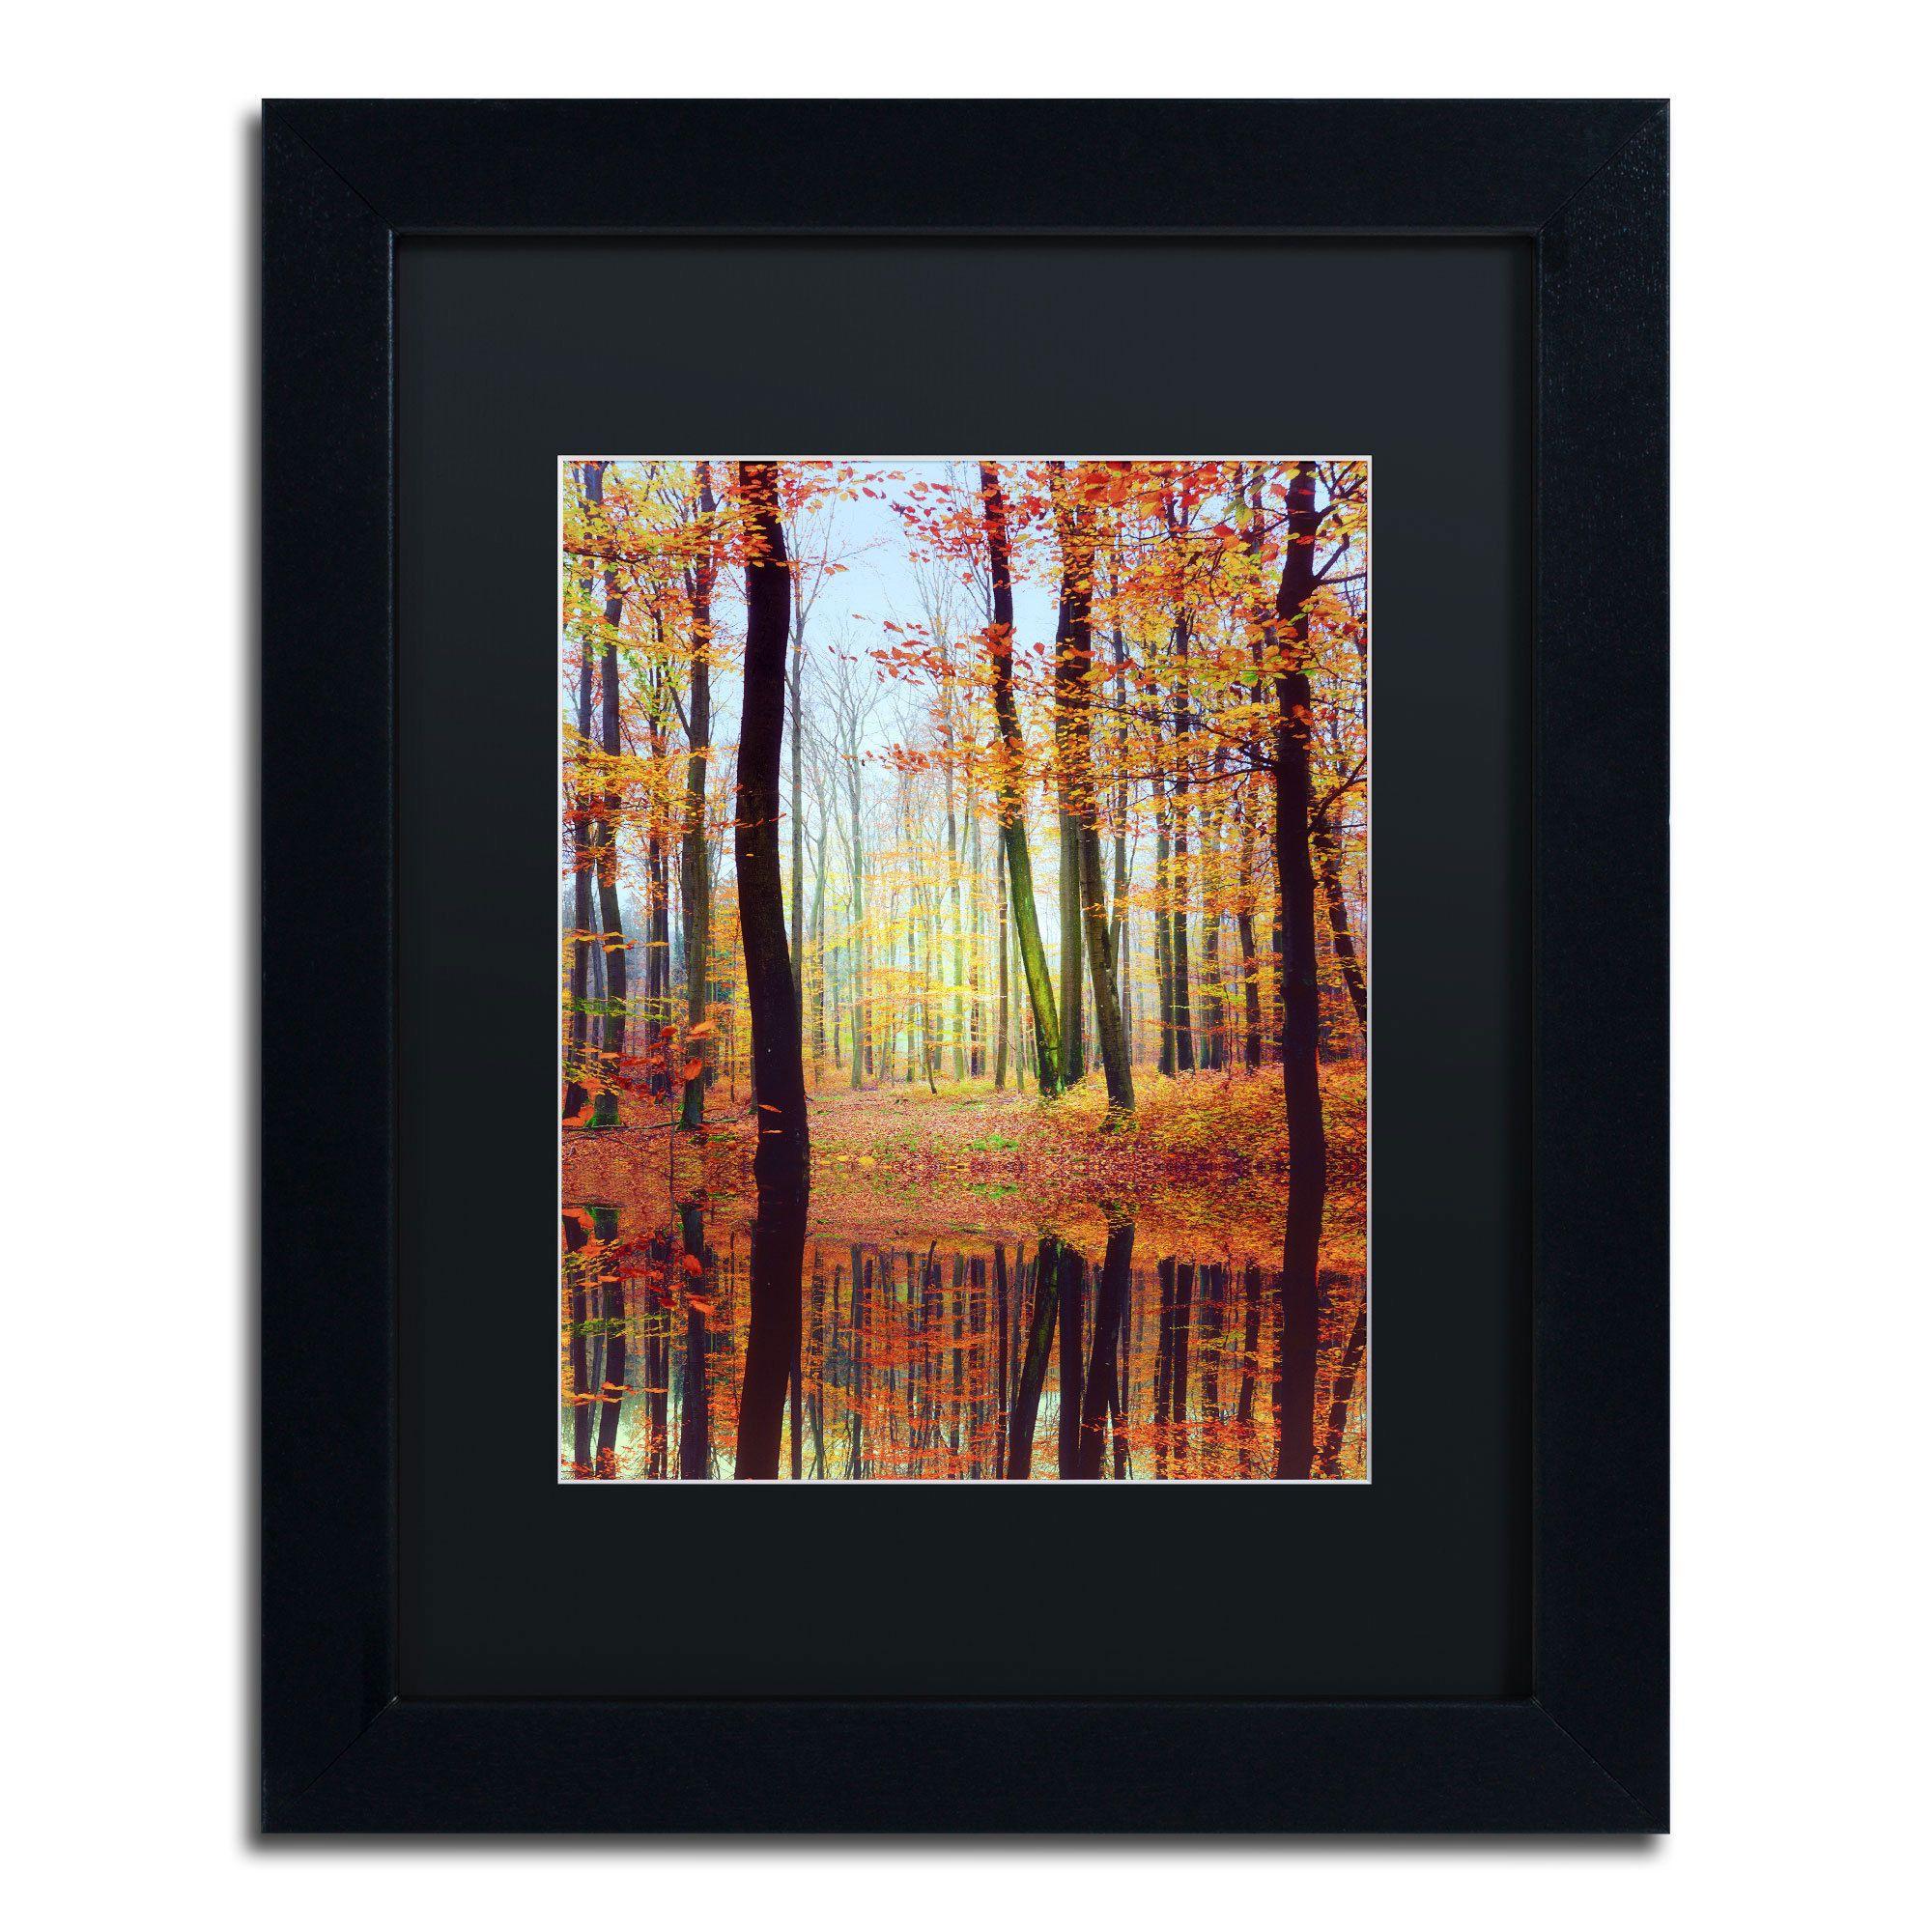 Philippe saintelaudy ufall mirroru framed matted art x brown